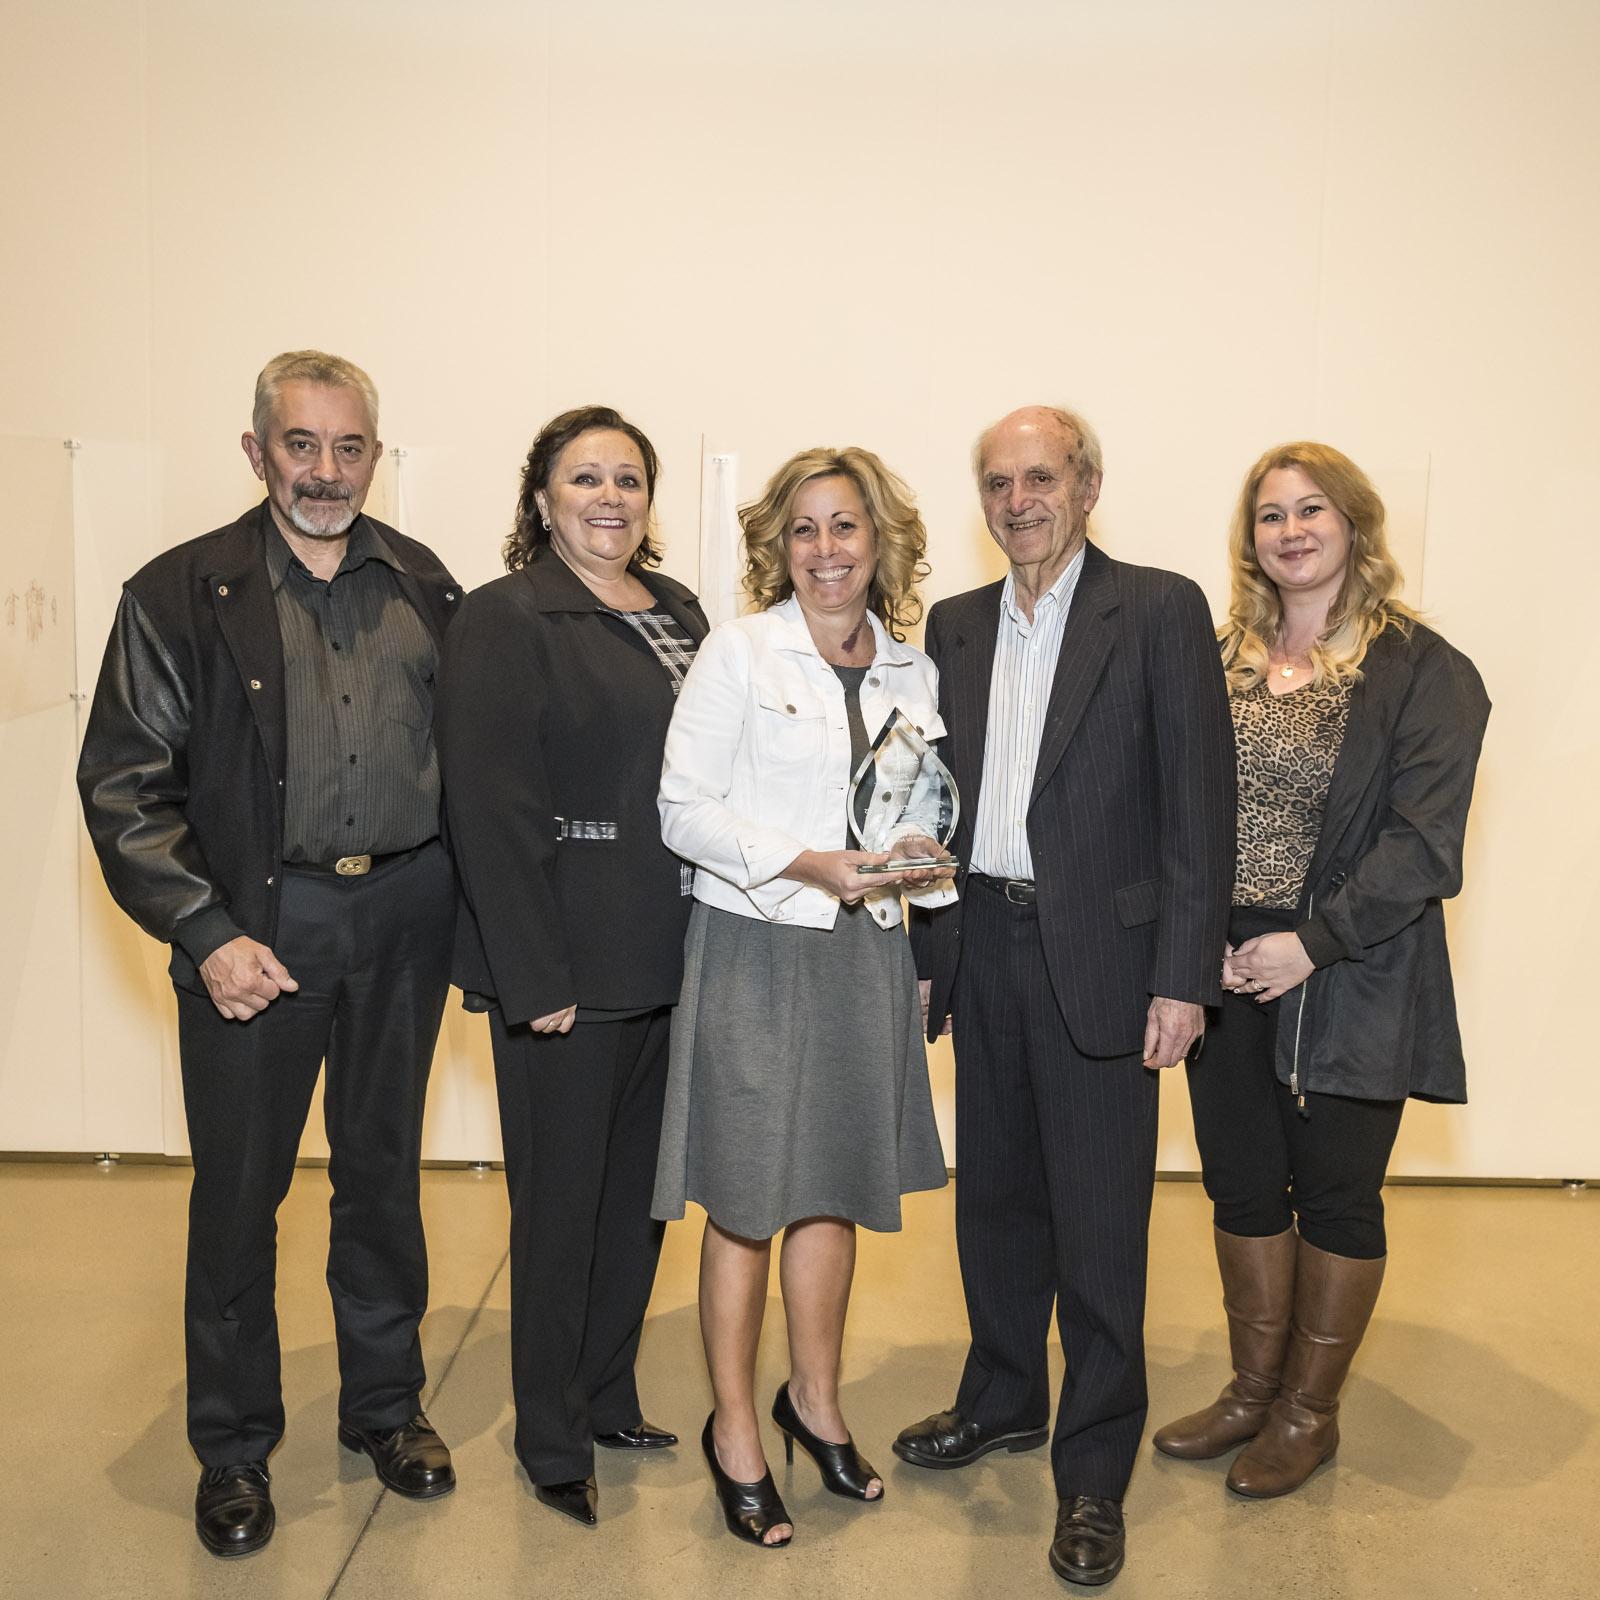 community_builders_awards_2019-7758-1600px